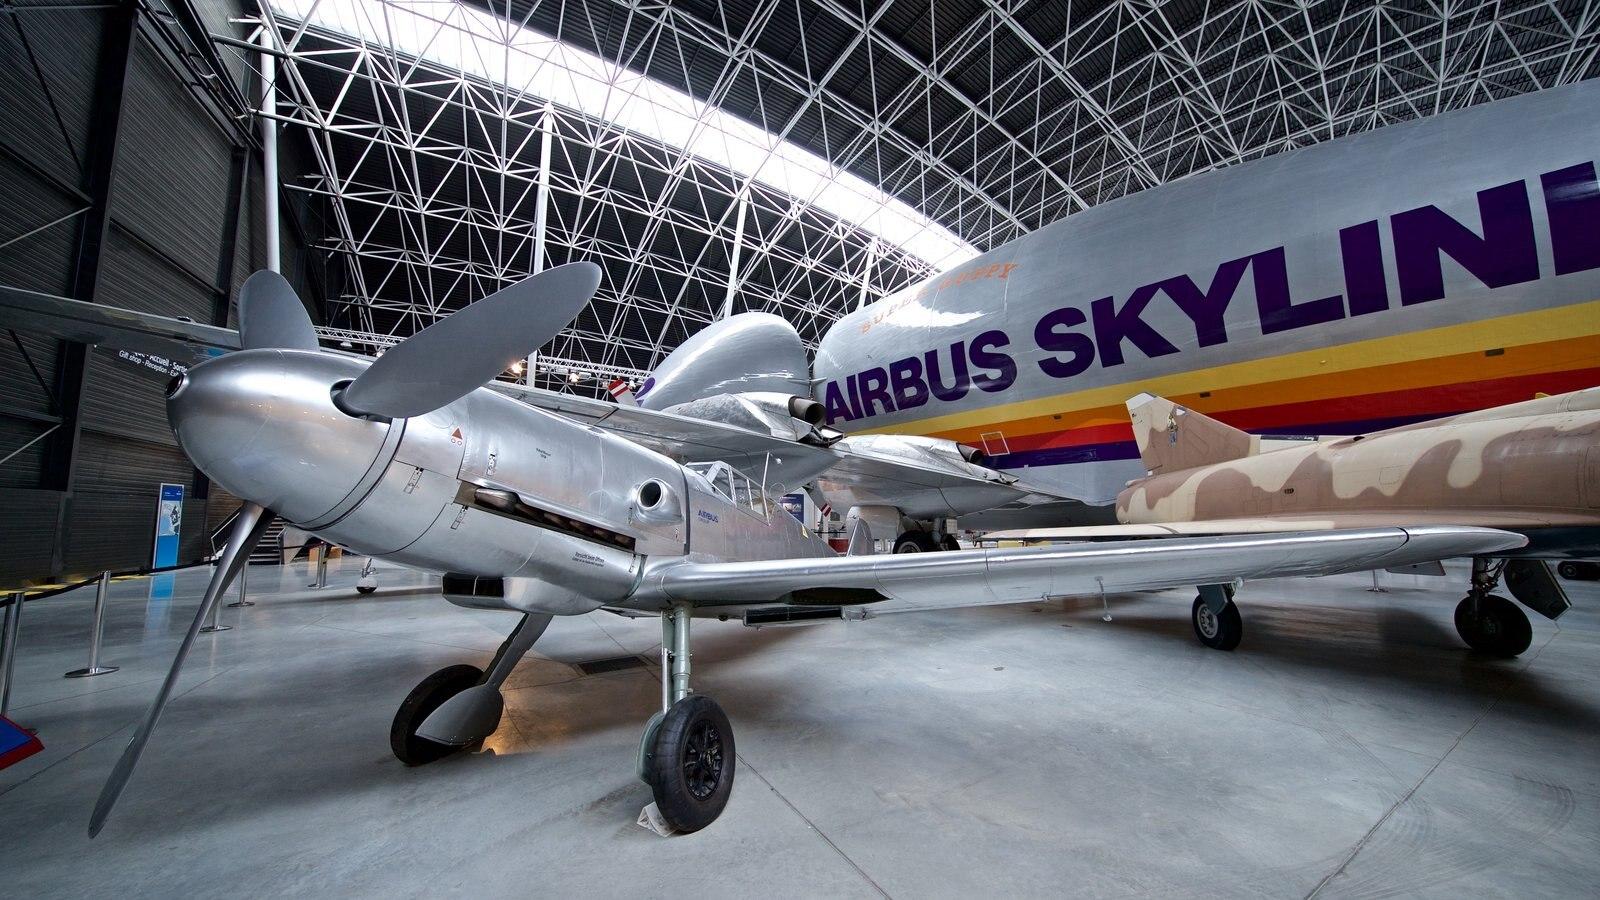 Airbus showing aircraft and interior views